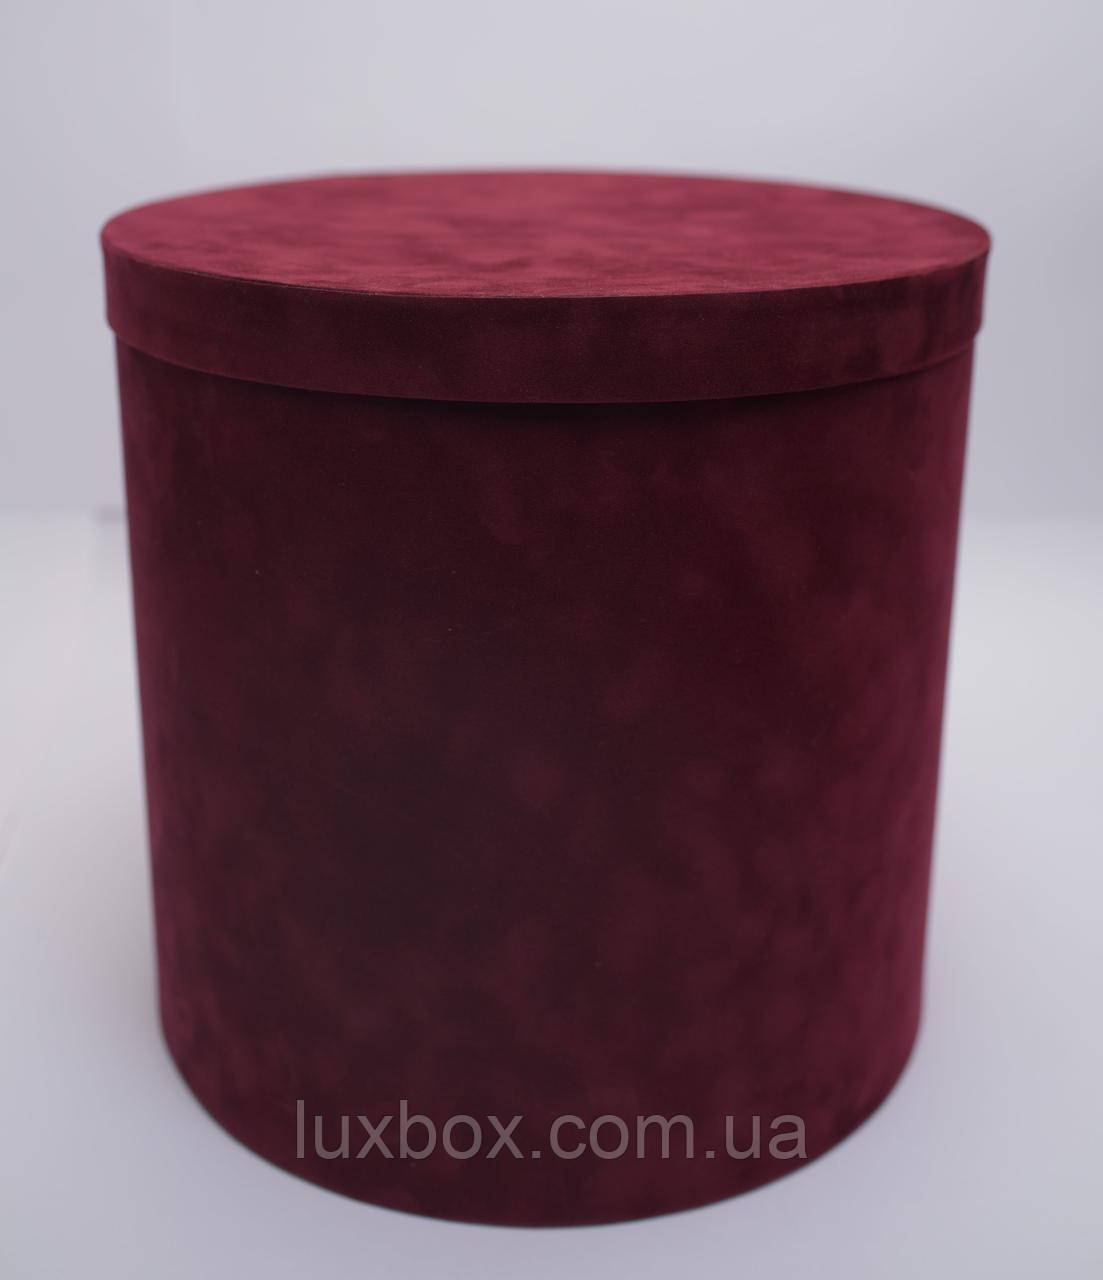 Шляпна коробка Велюрова(бархатна коробка) h40/d40